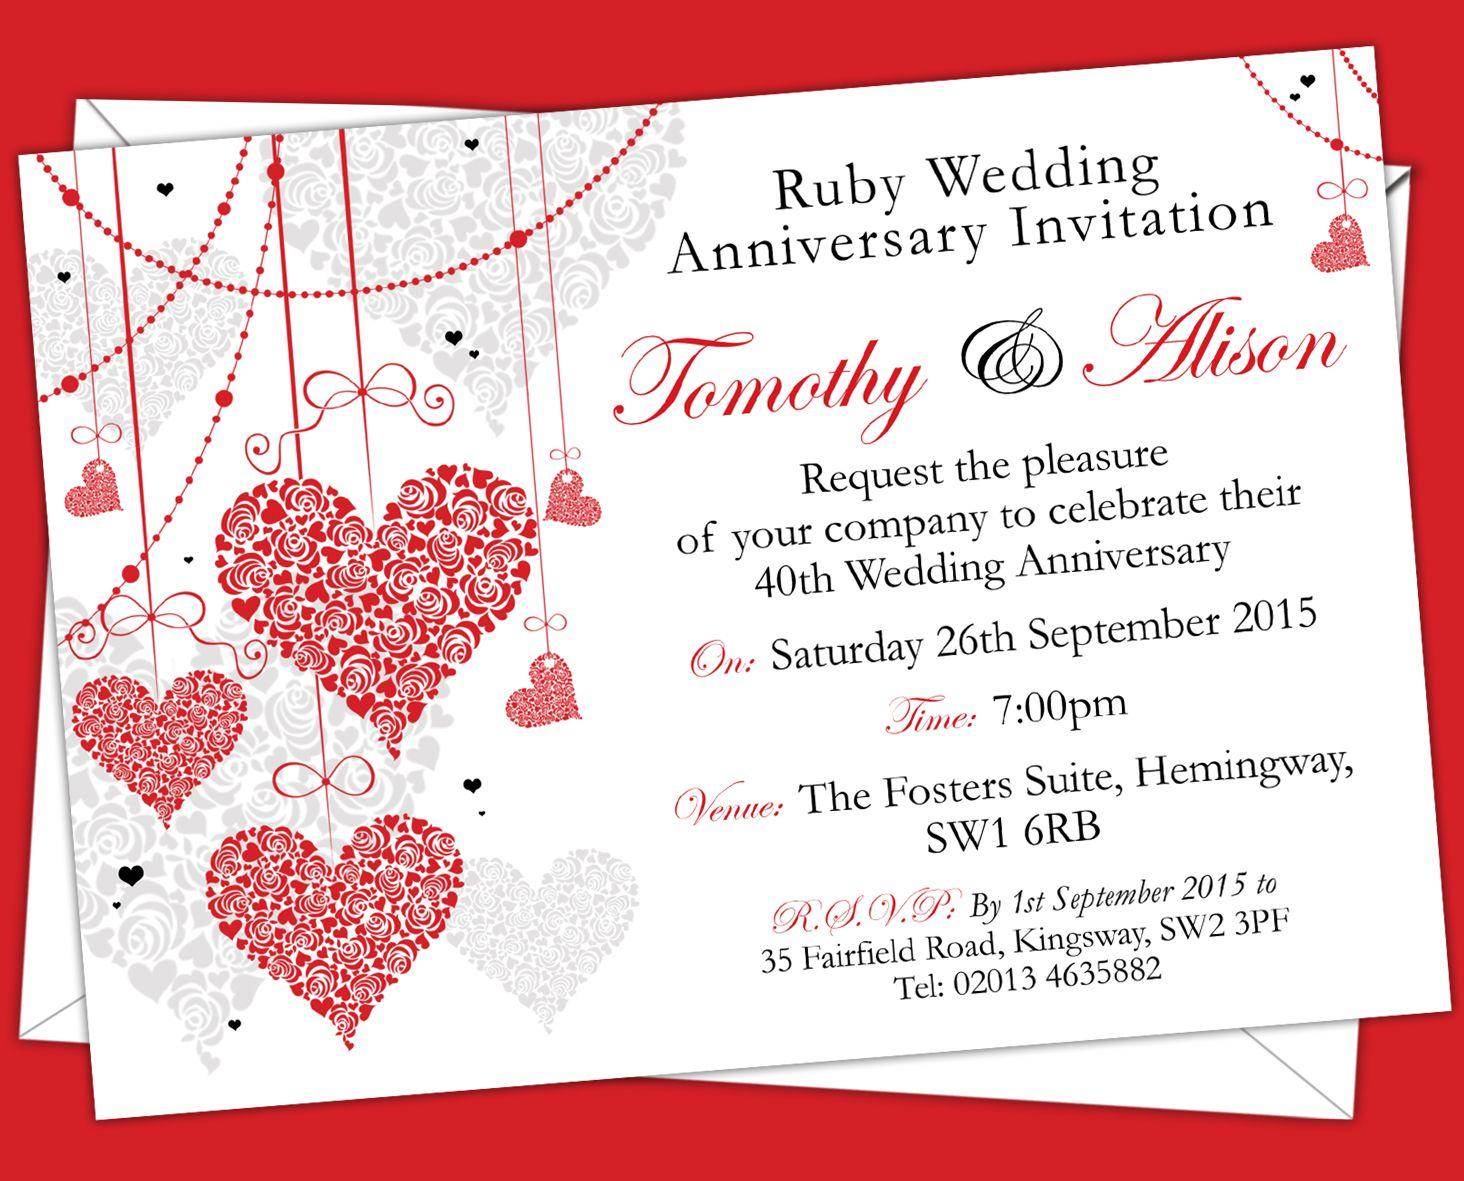 Personalised Ruby Wedding Anniversary Invitations Prices Start